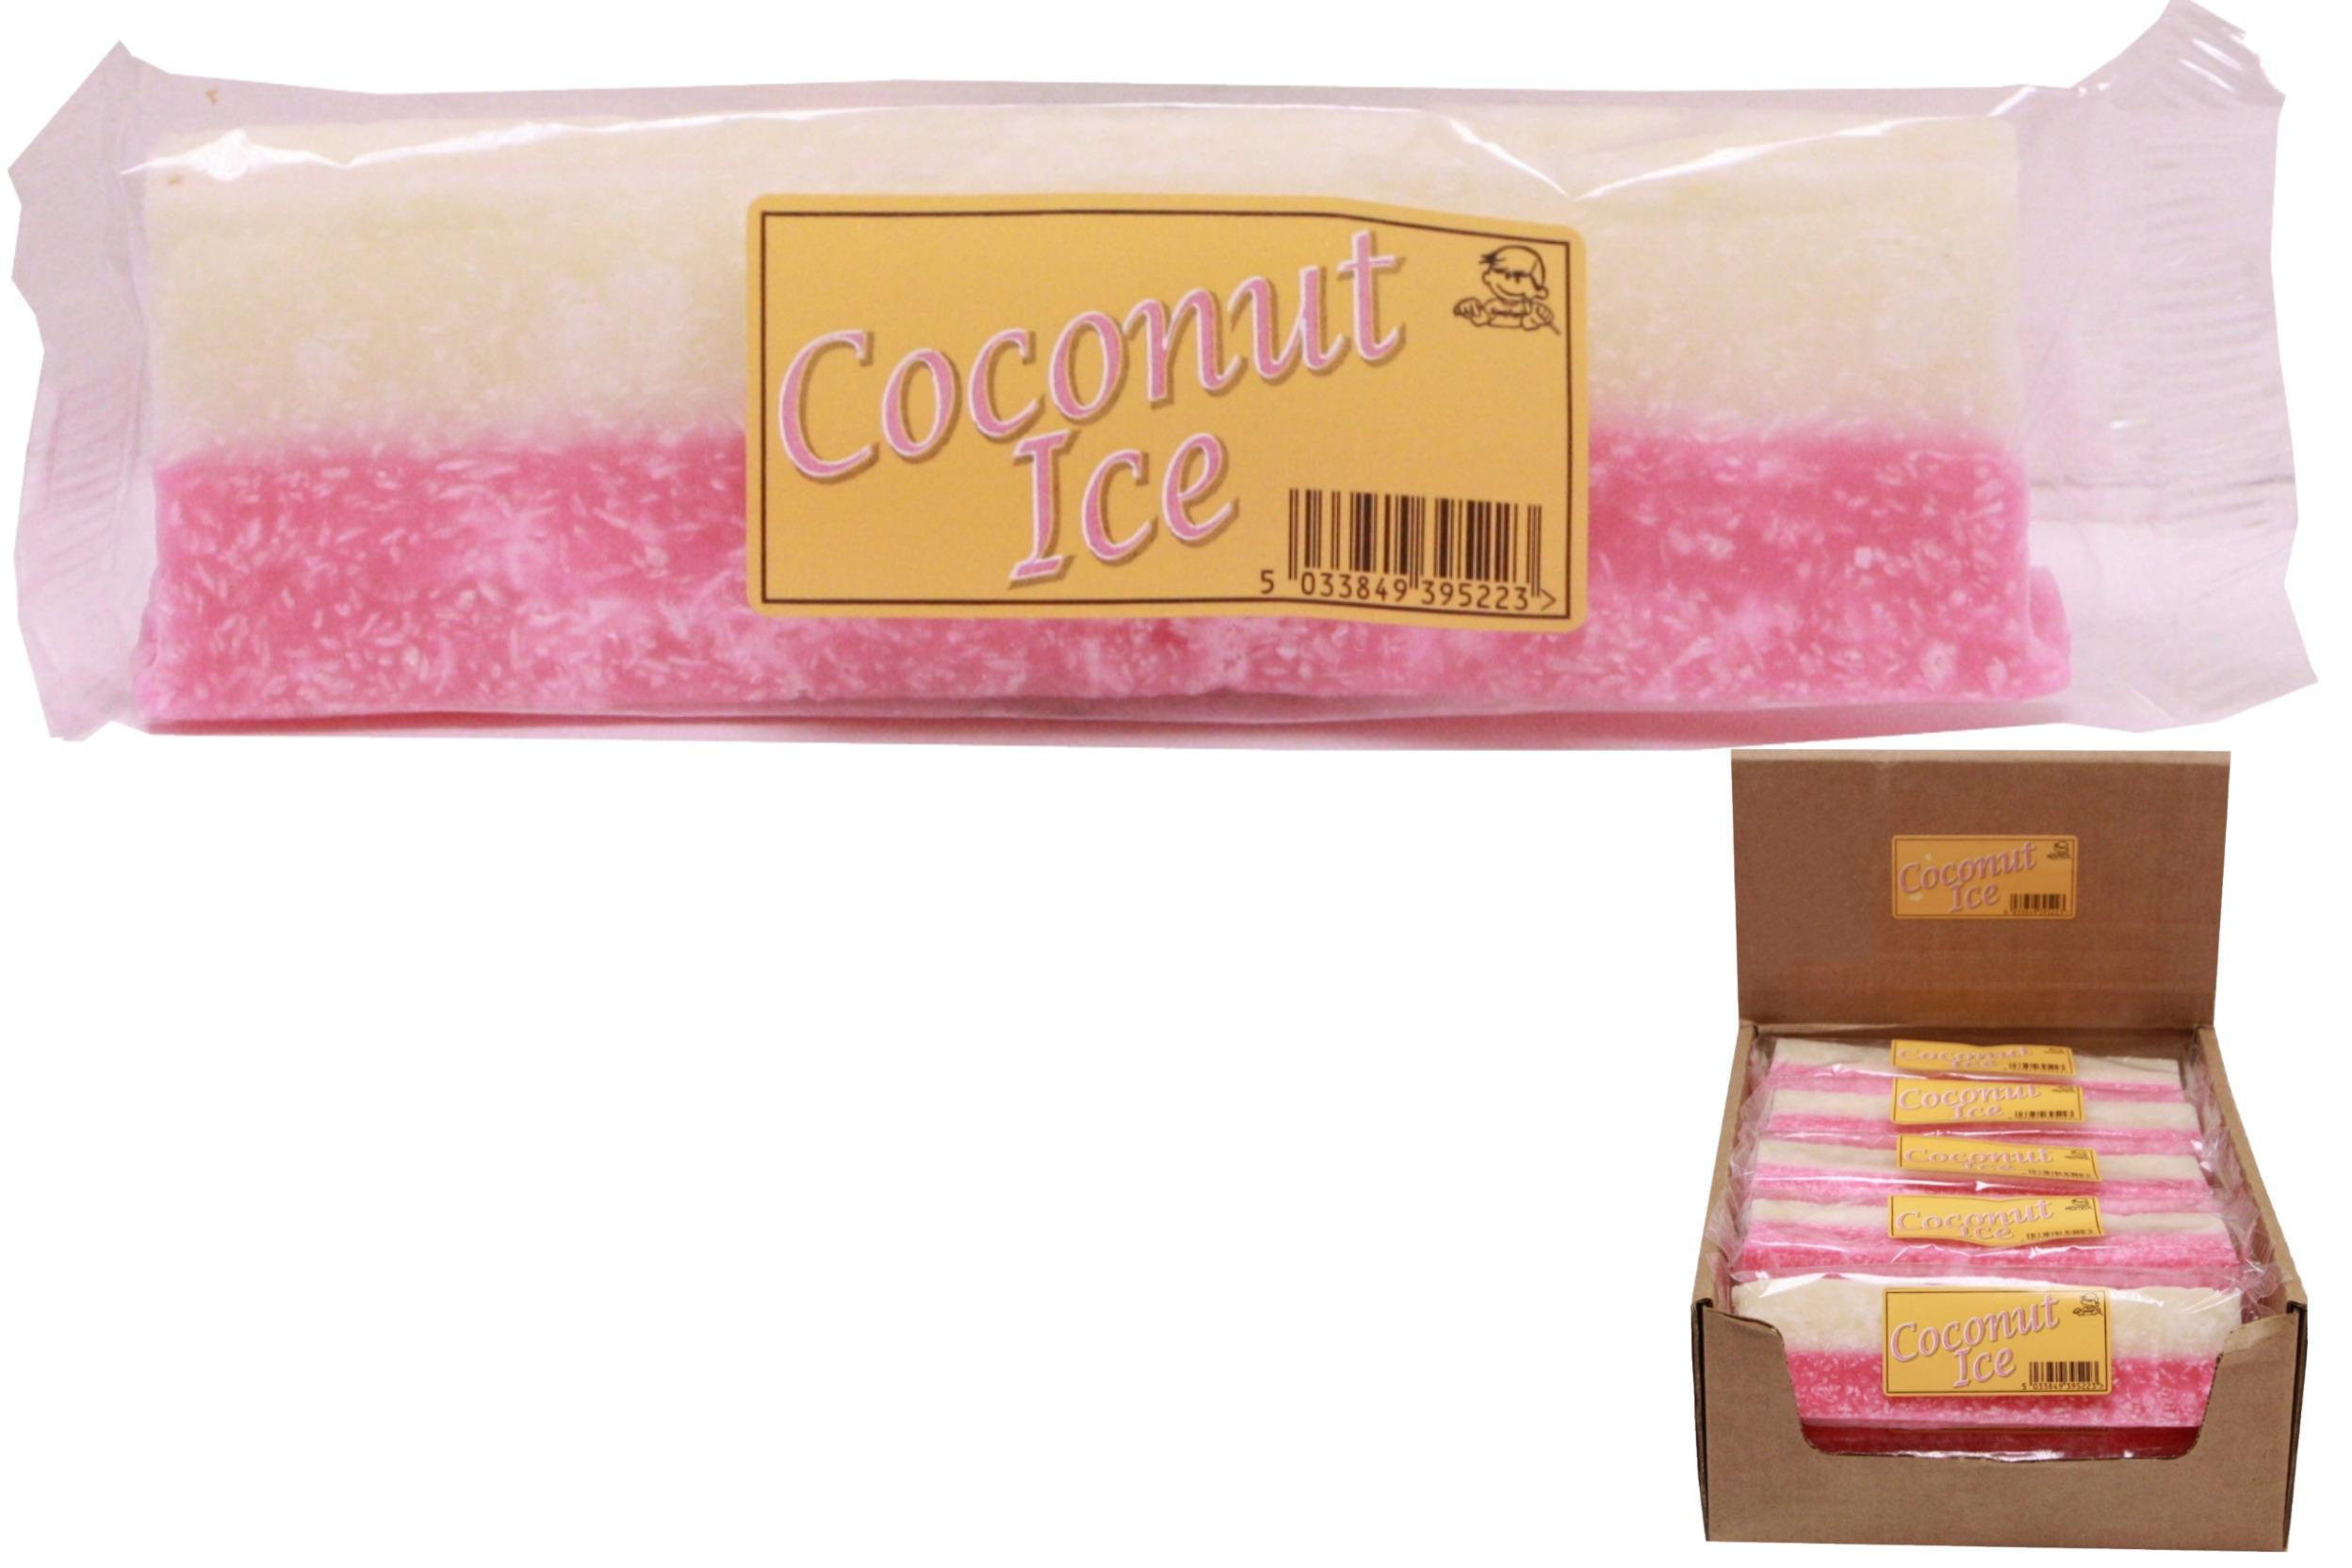 130g Coconut Ice Bar